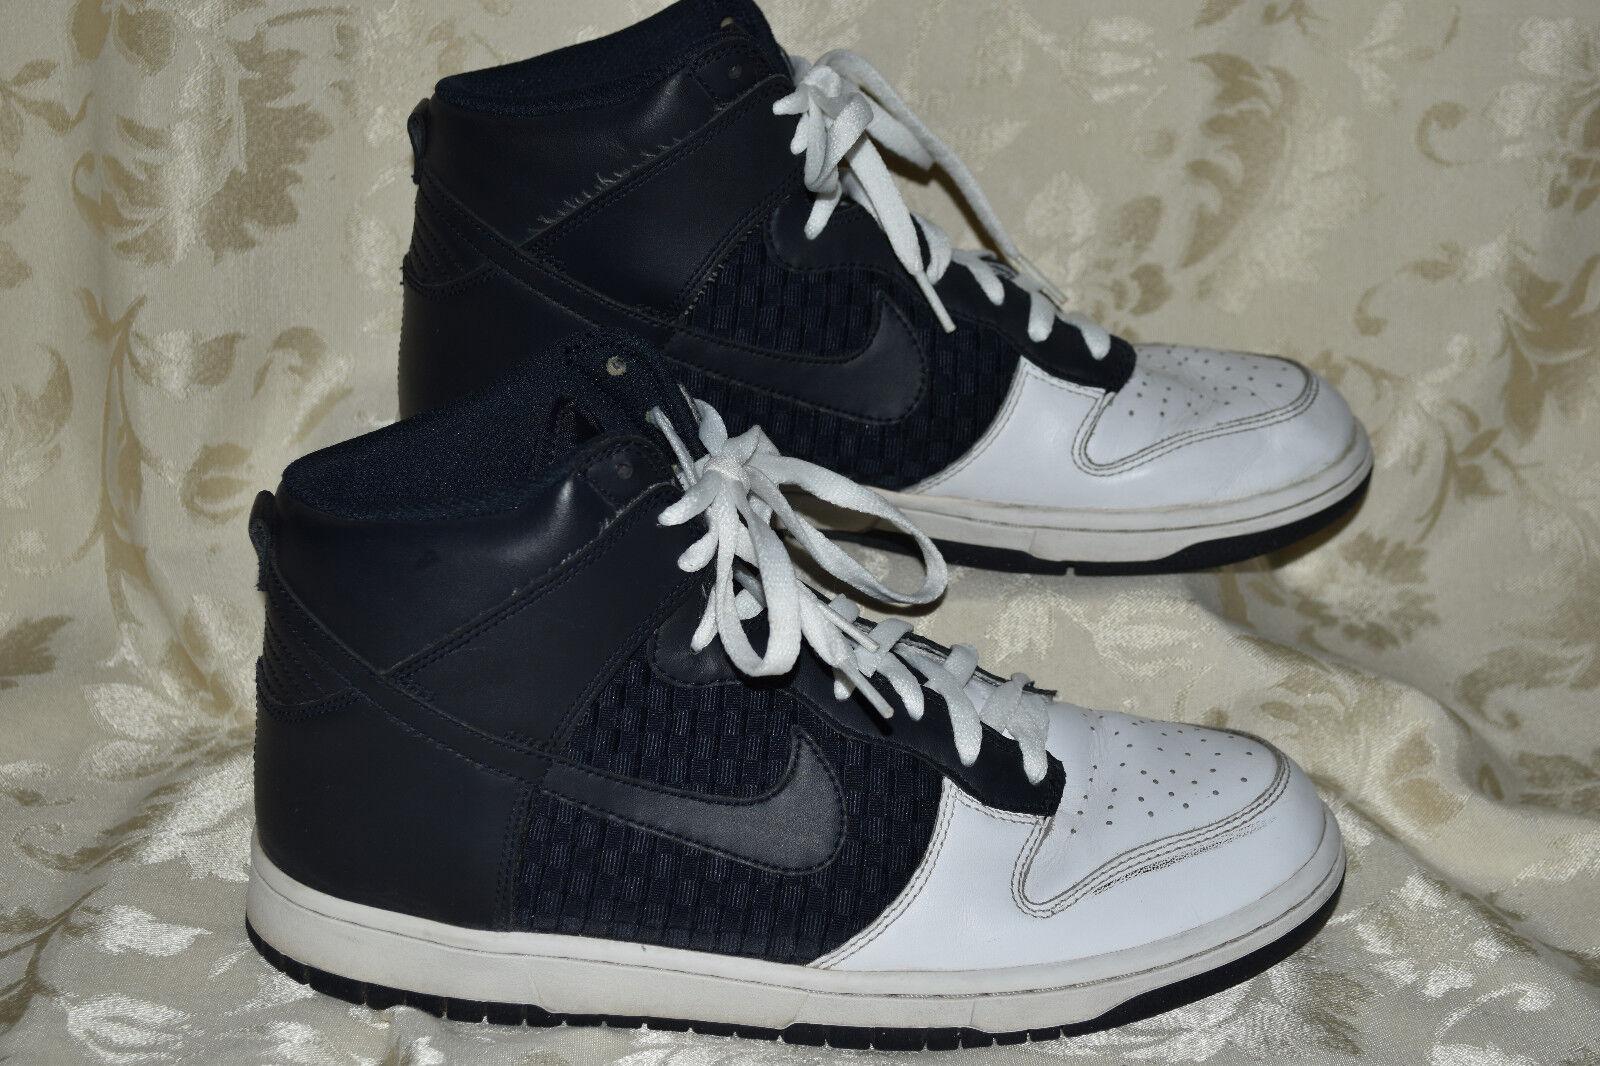 competitive price a5dd2 561a6 Nike Dunk High 317982-143 Mens 10 Basketball Basketball Basketball Shoes  Sneakers Woven Dark Obsidian